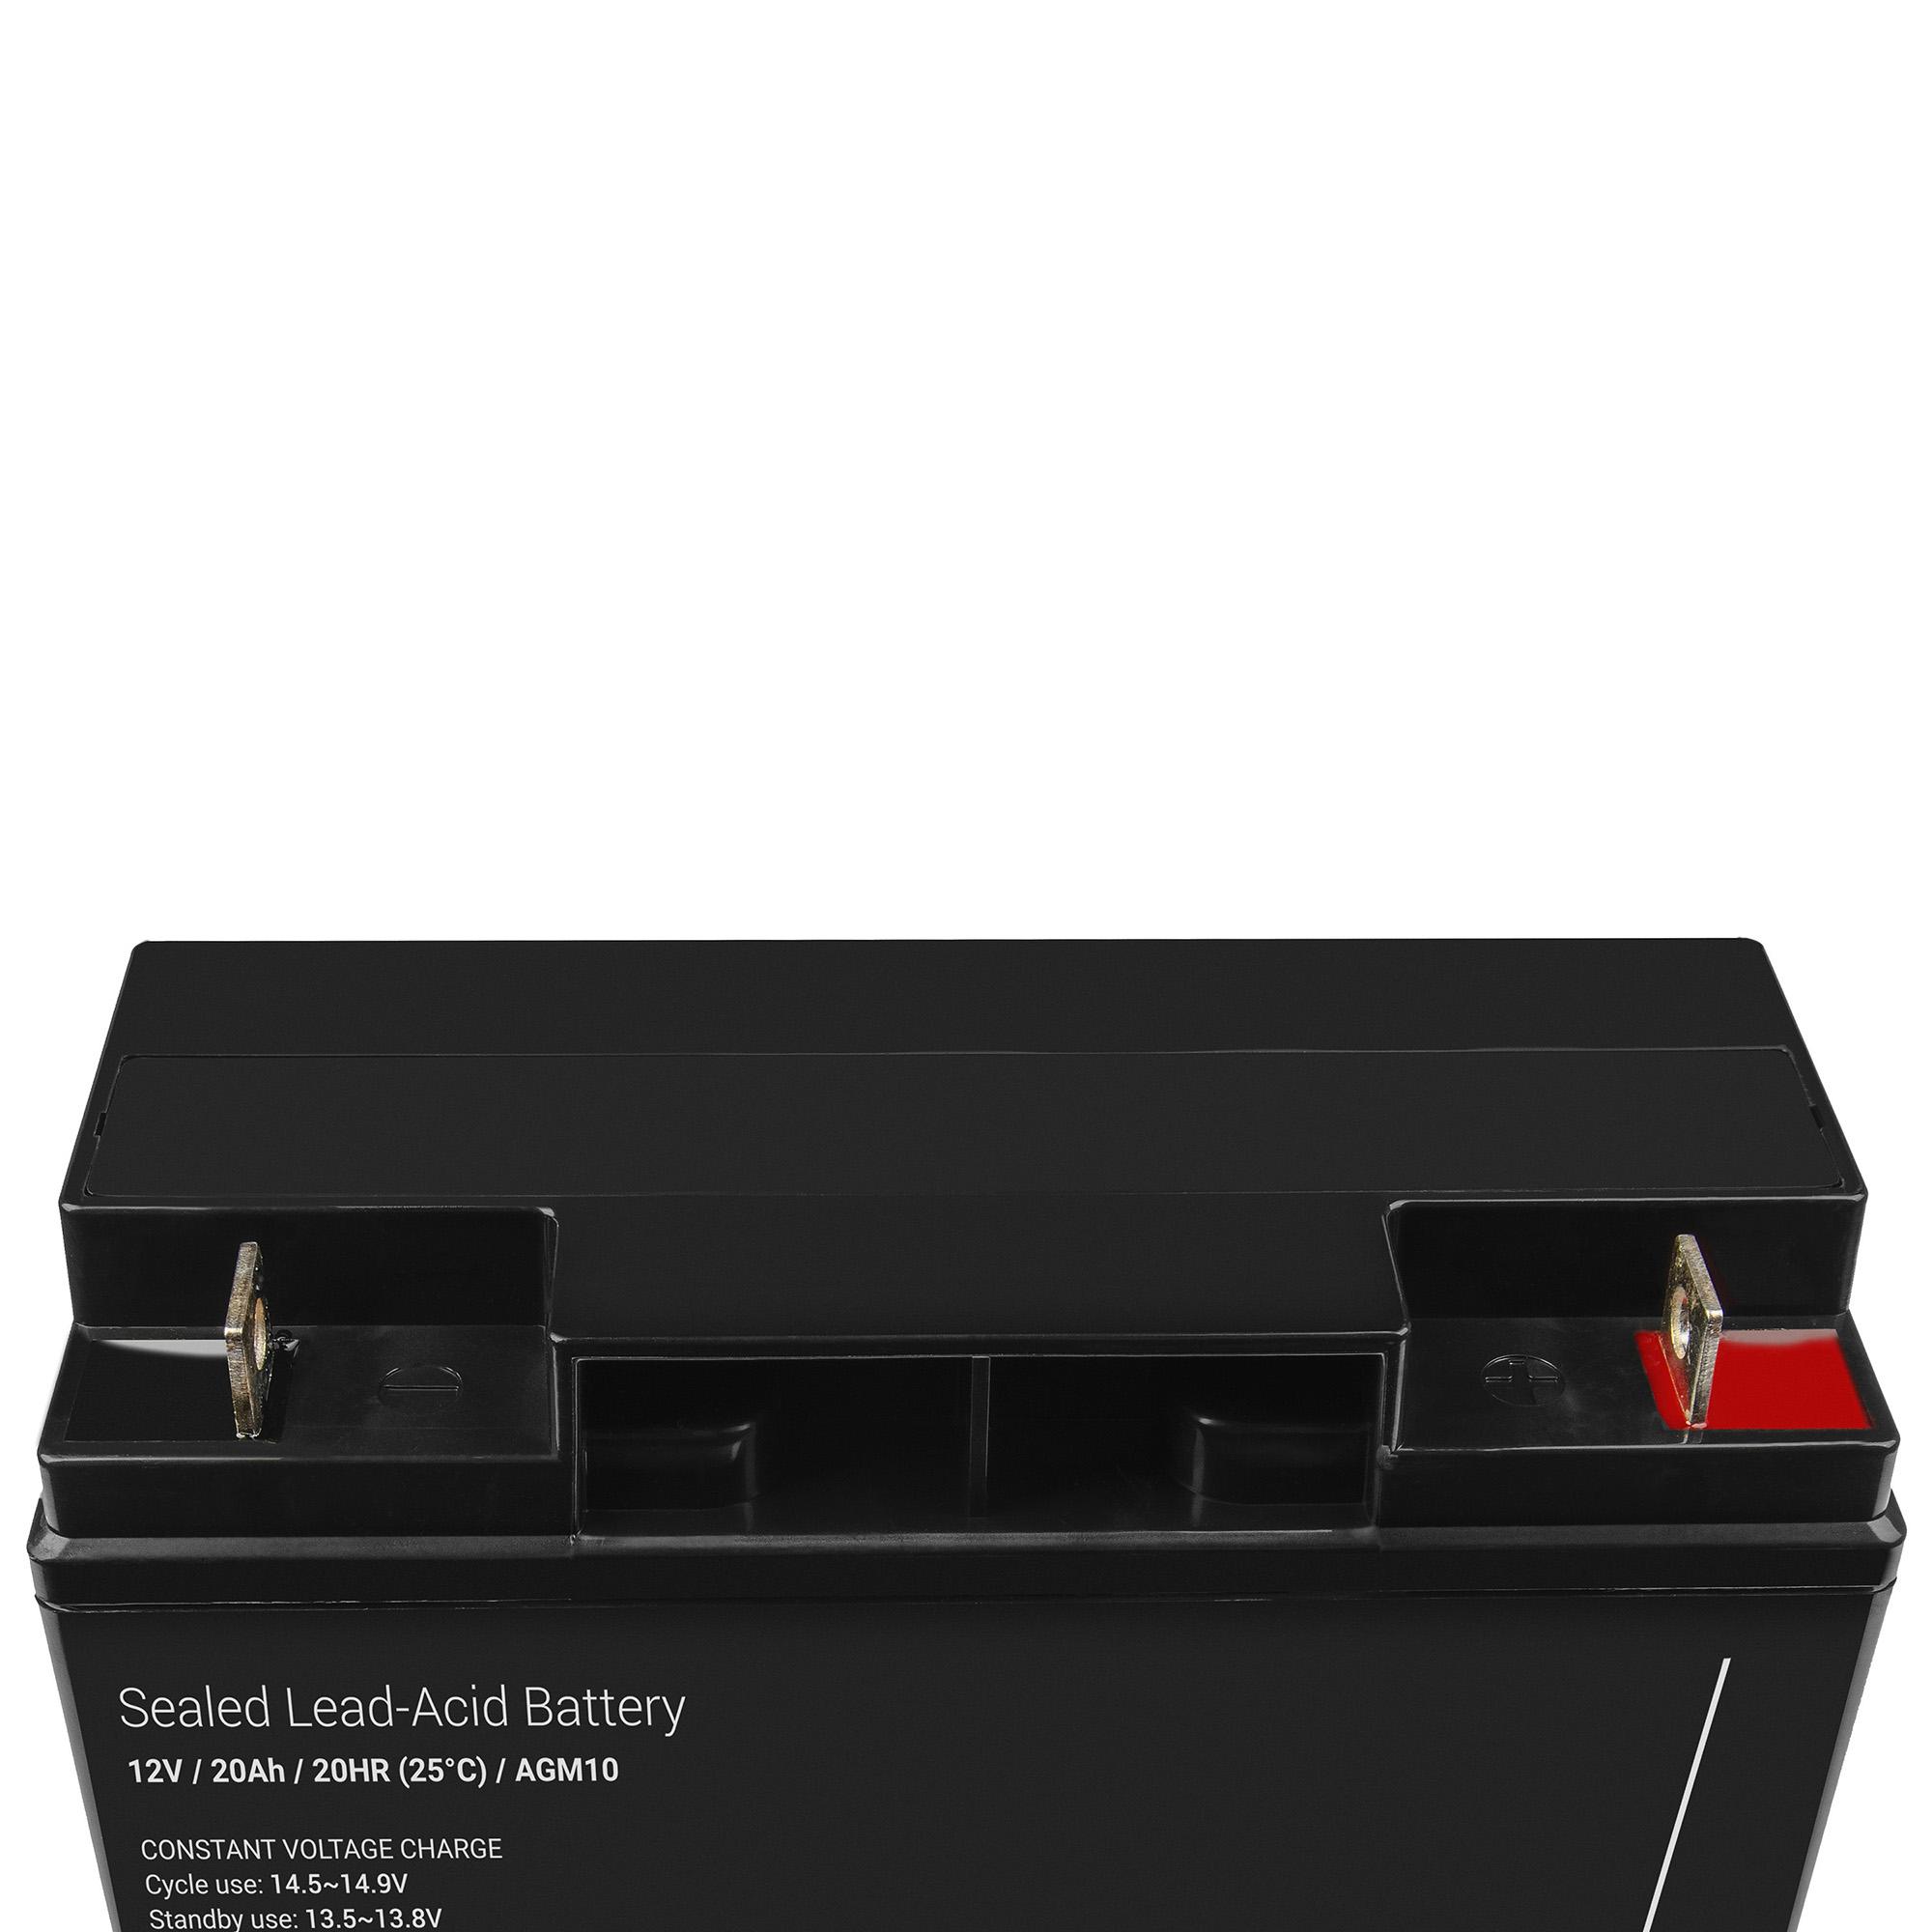 agm vrla battery for apc smart ups rm su3000rmx93 20ah. Black Bedroom Furniture Sets. Home Design Ideas